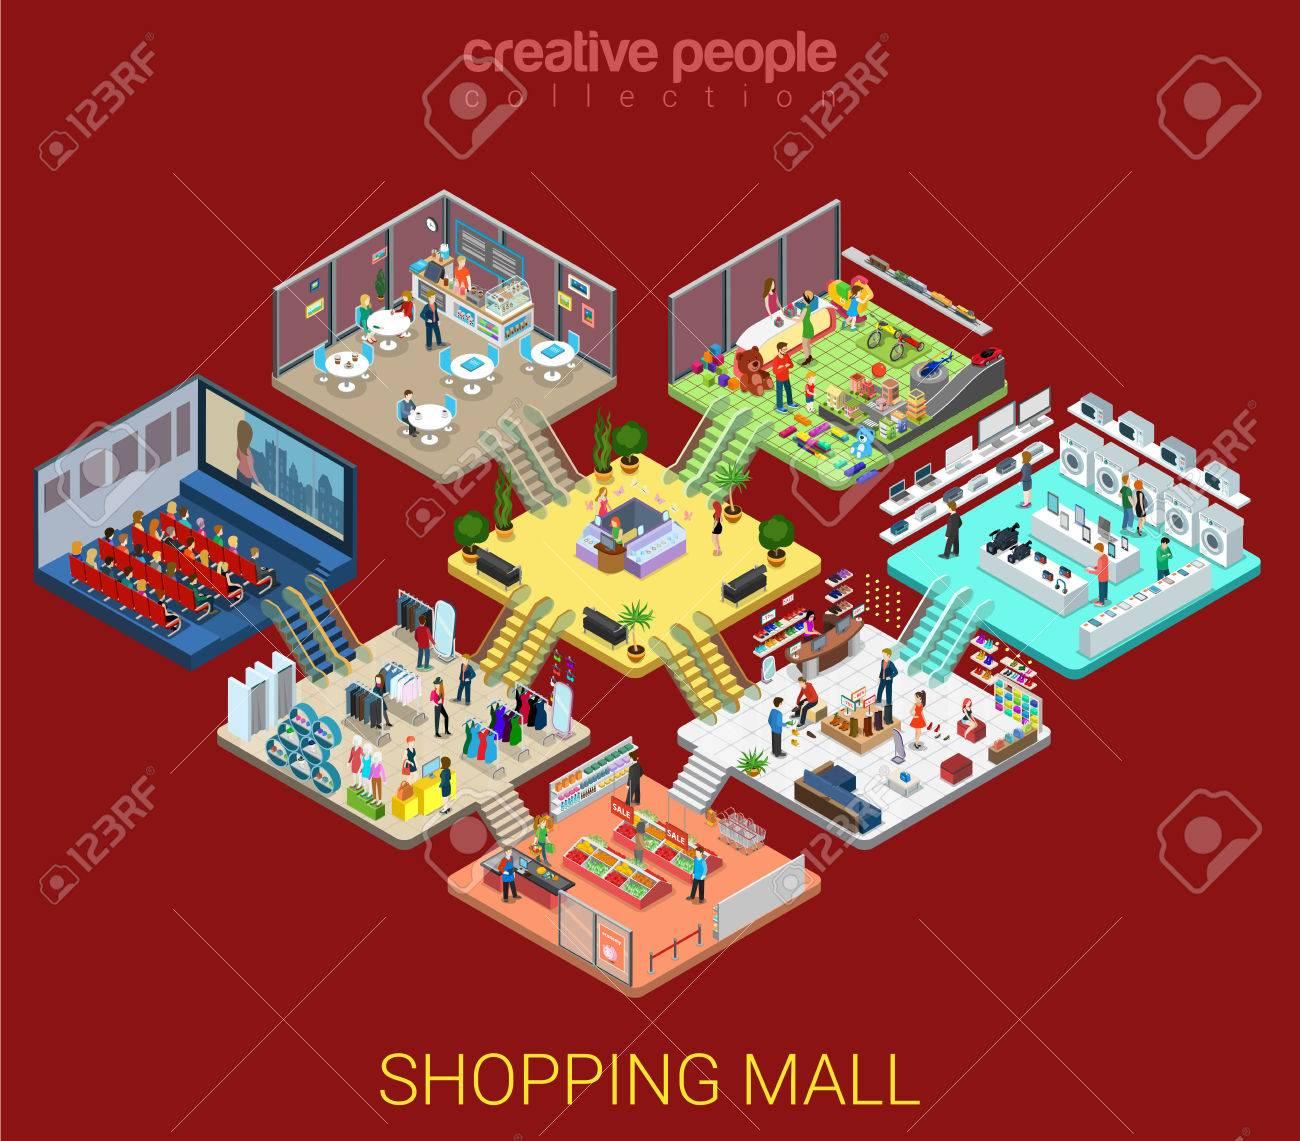 Flat isometric Shopping mall interior illustration. - 65793264